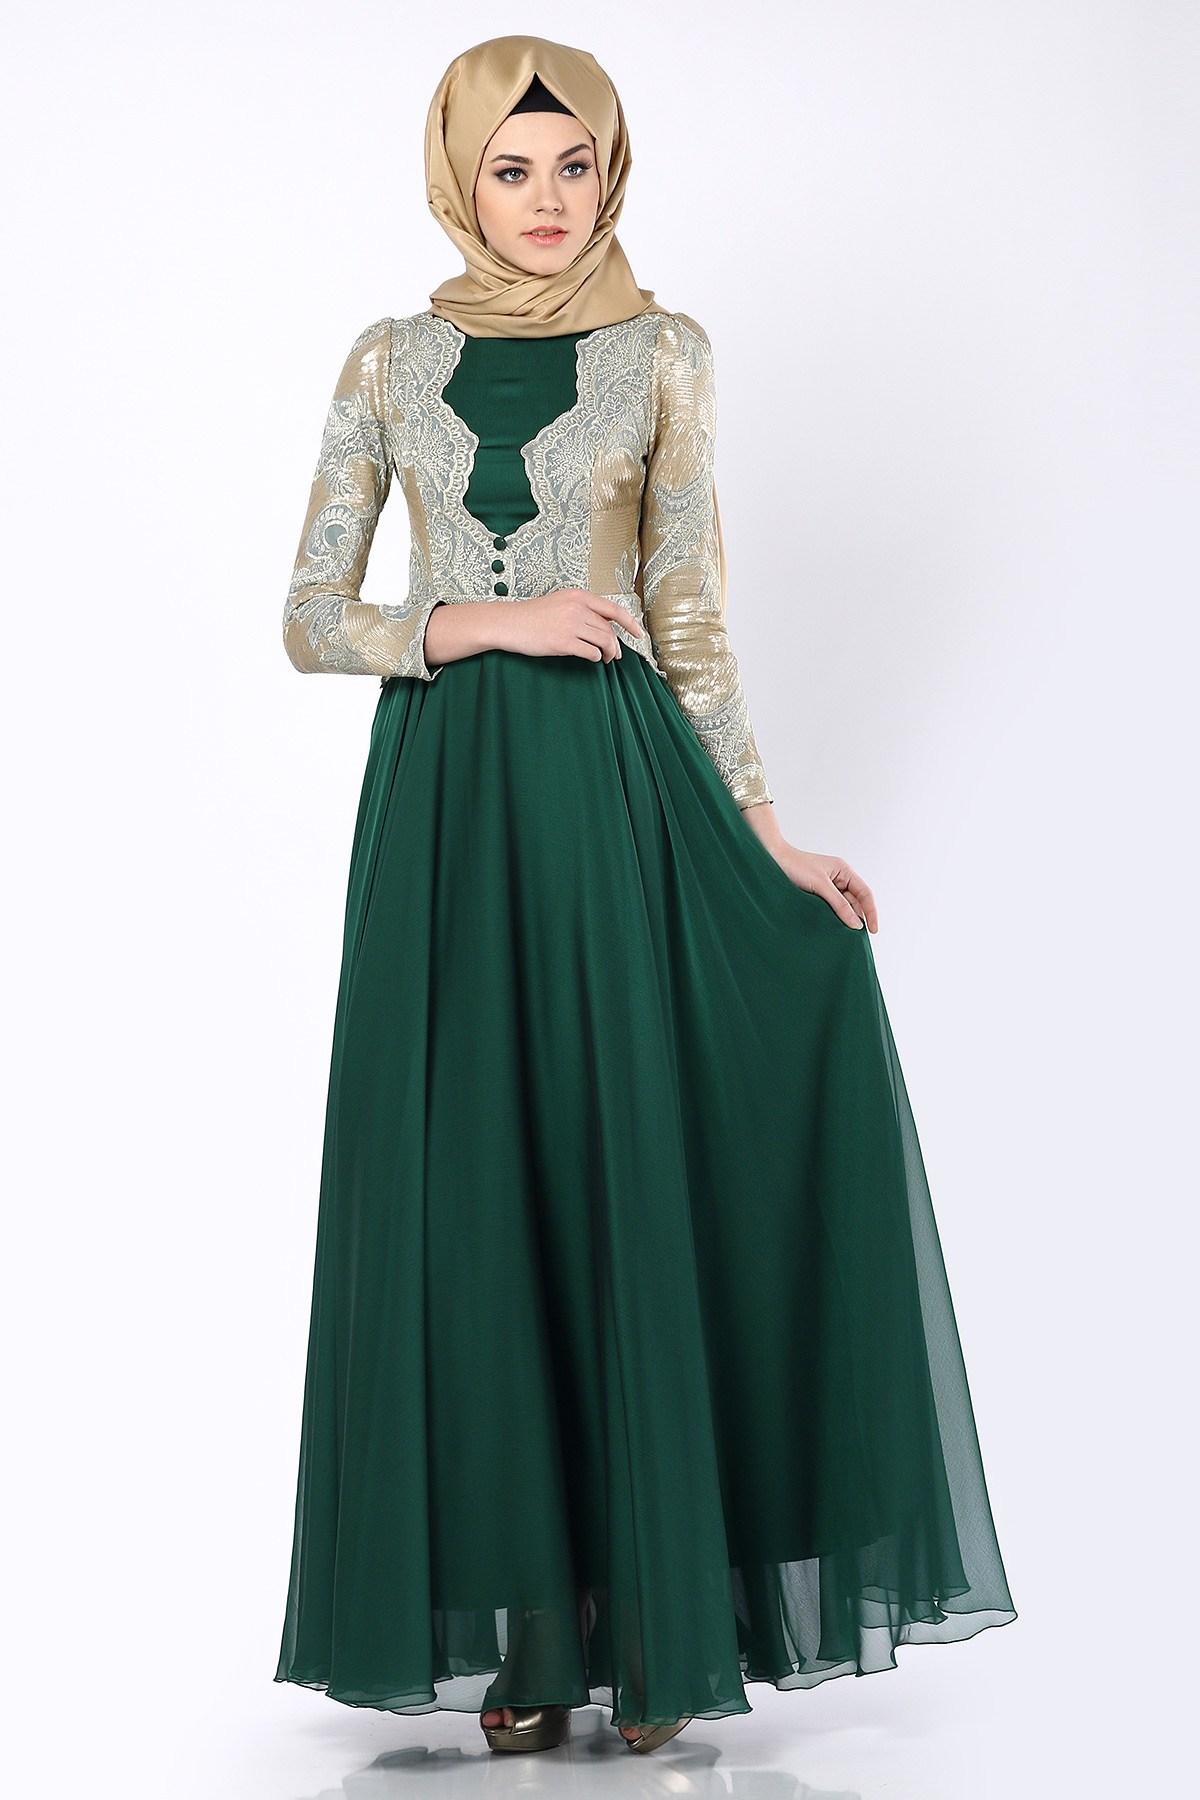 بالصور فساتين محجبات خروج , اروع فستان مناسب للخروج مخصص لكل بنت محجبة 4843 1